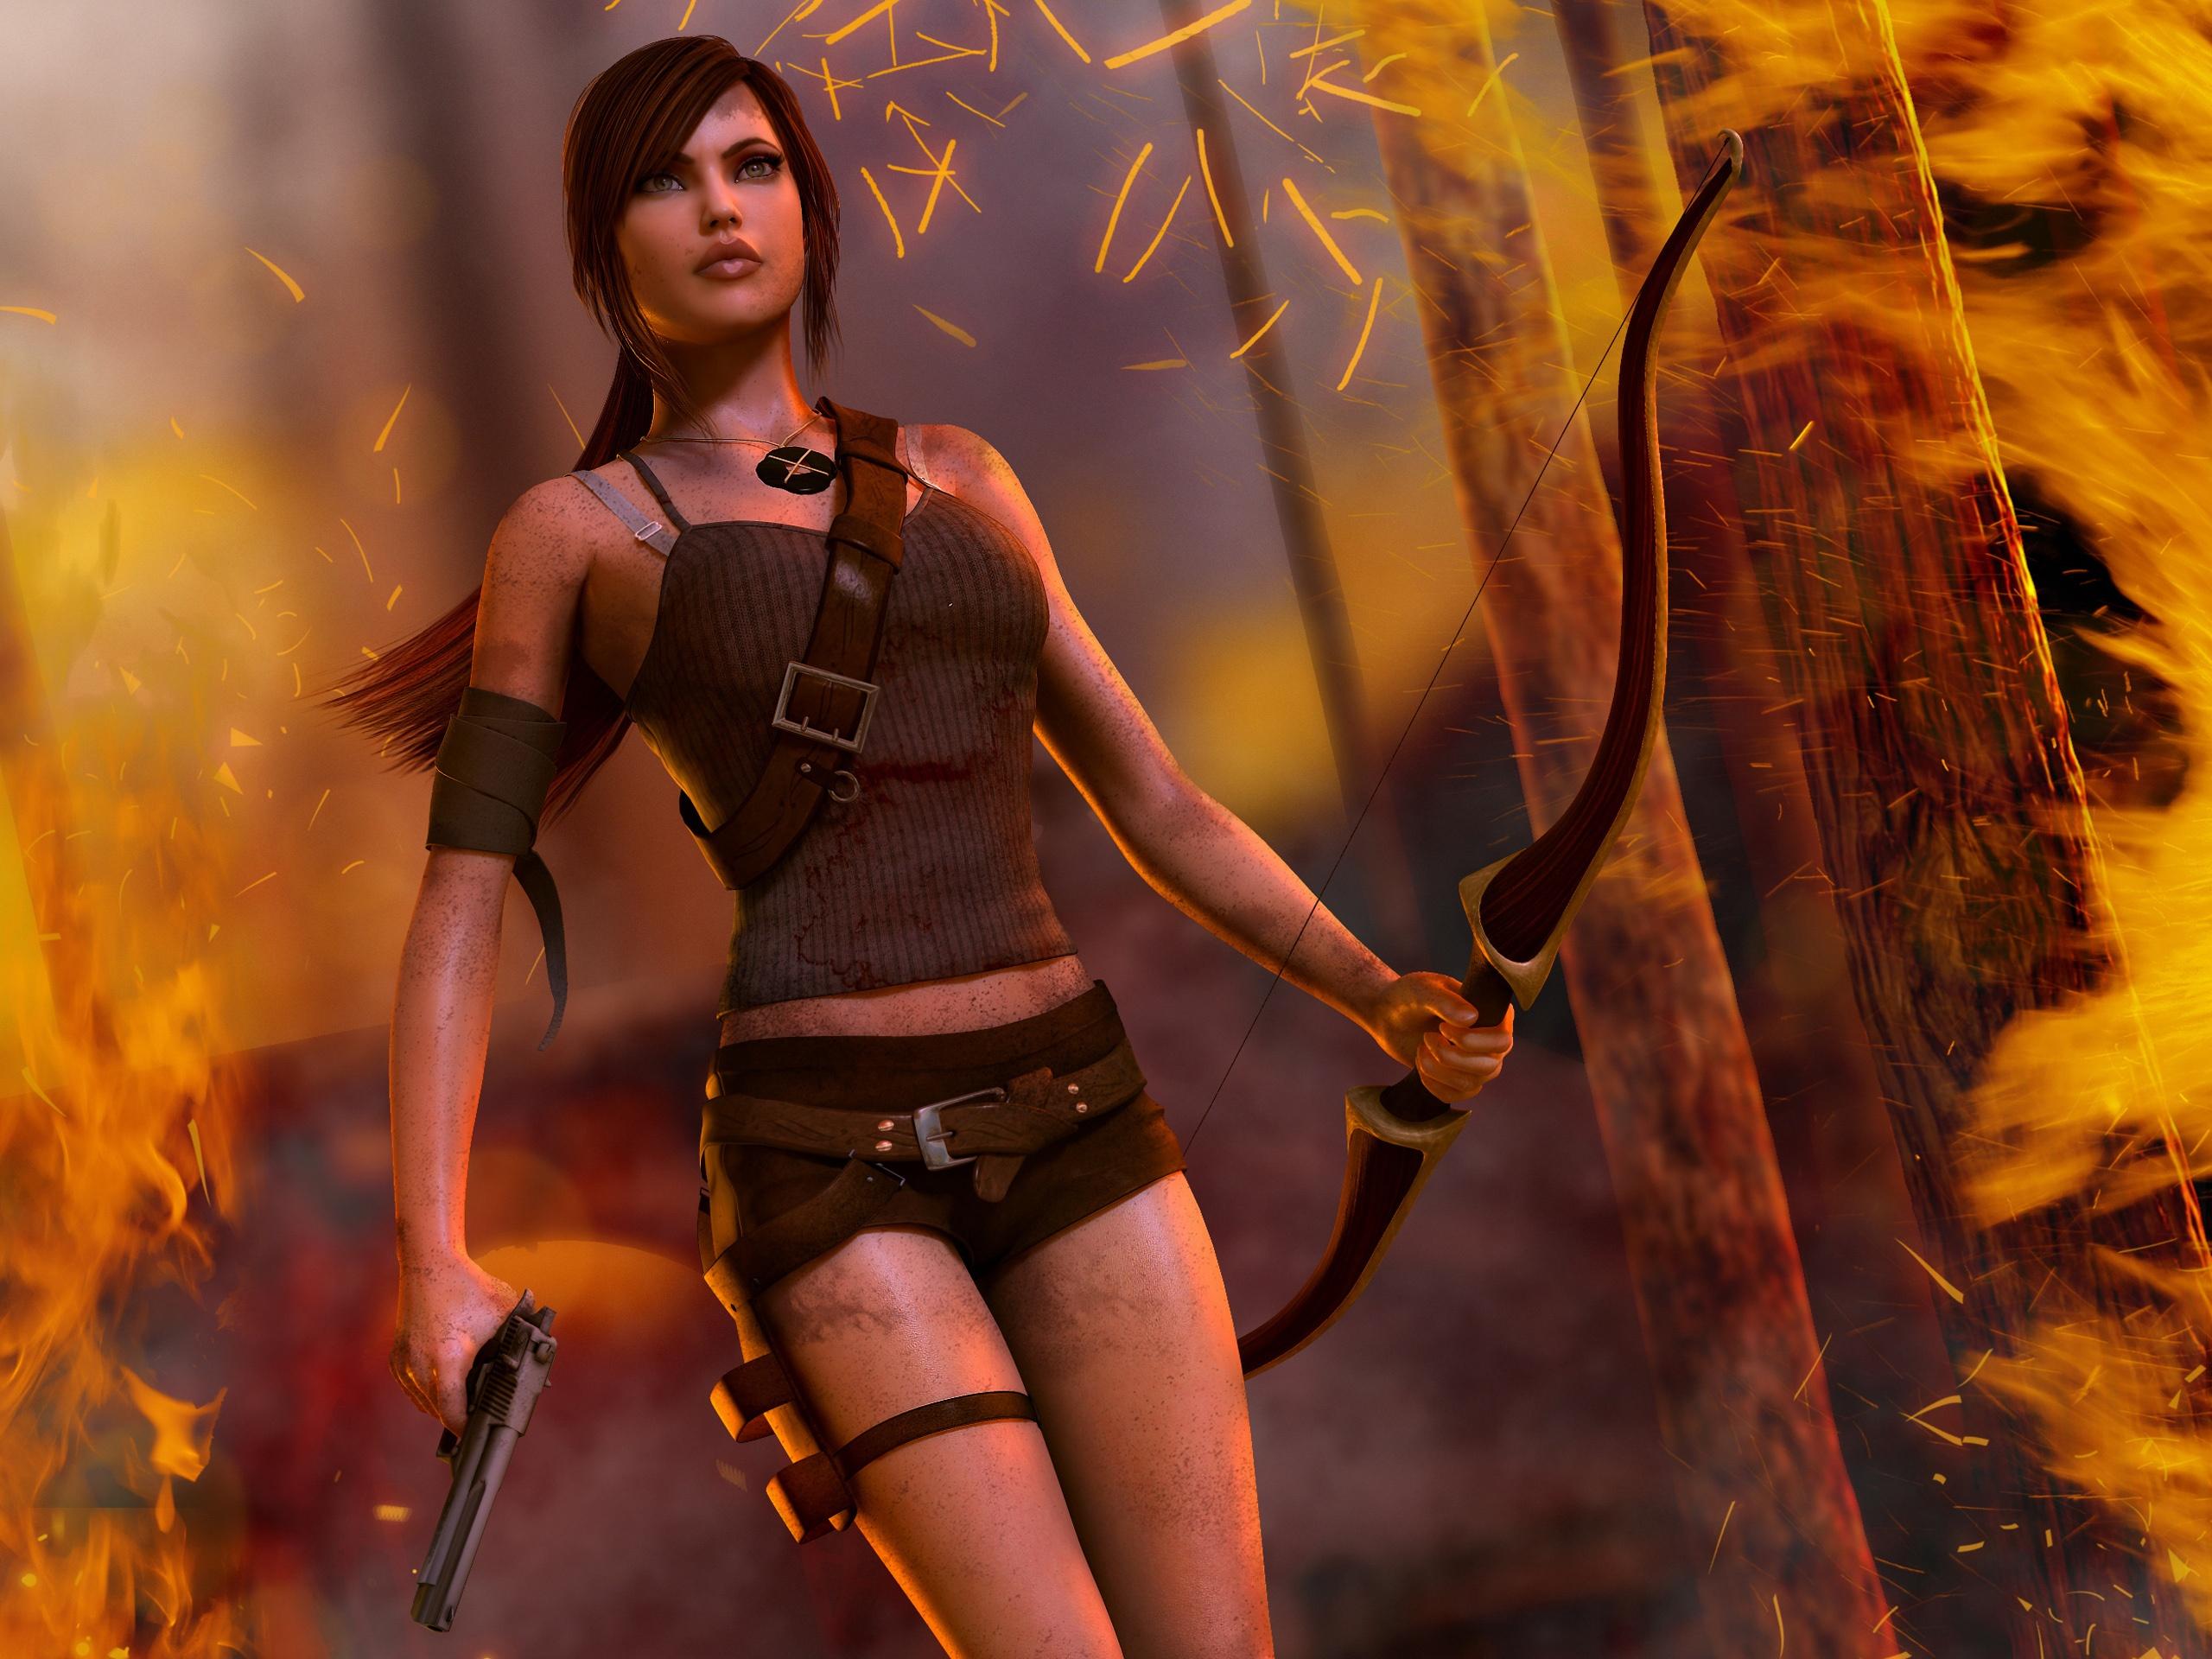 7680x4320 Lara Croft 8k Artwork 8k Hd 4k Wallpapers: 배경 화면 툼 레이더, 라라 크로프트, 아름다운 소녀 2560x1920 HD 그림, 이미지